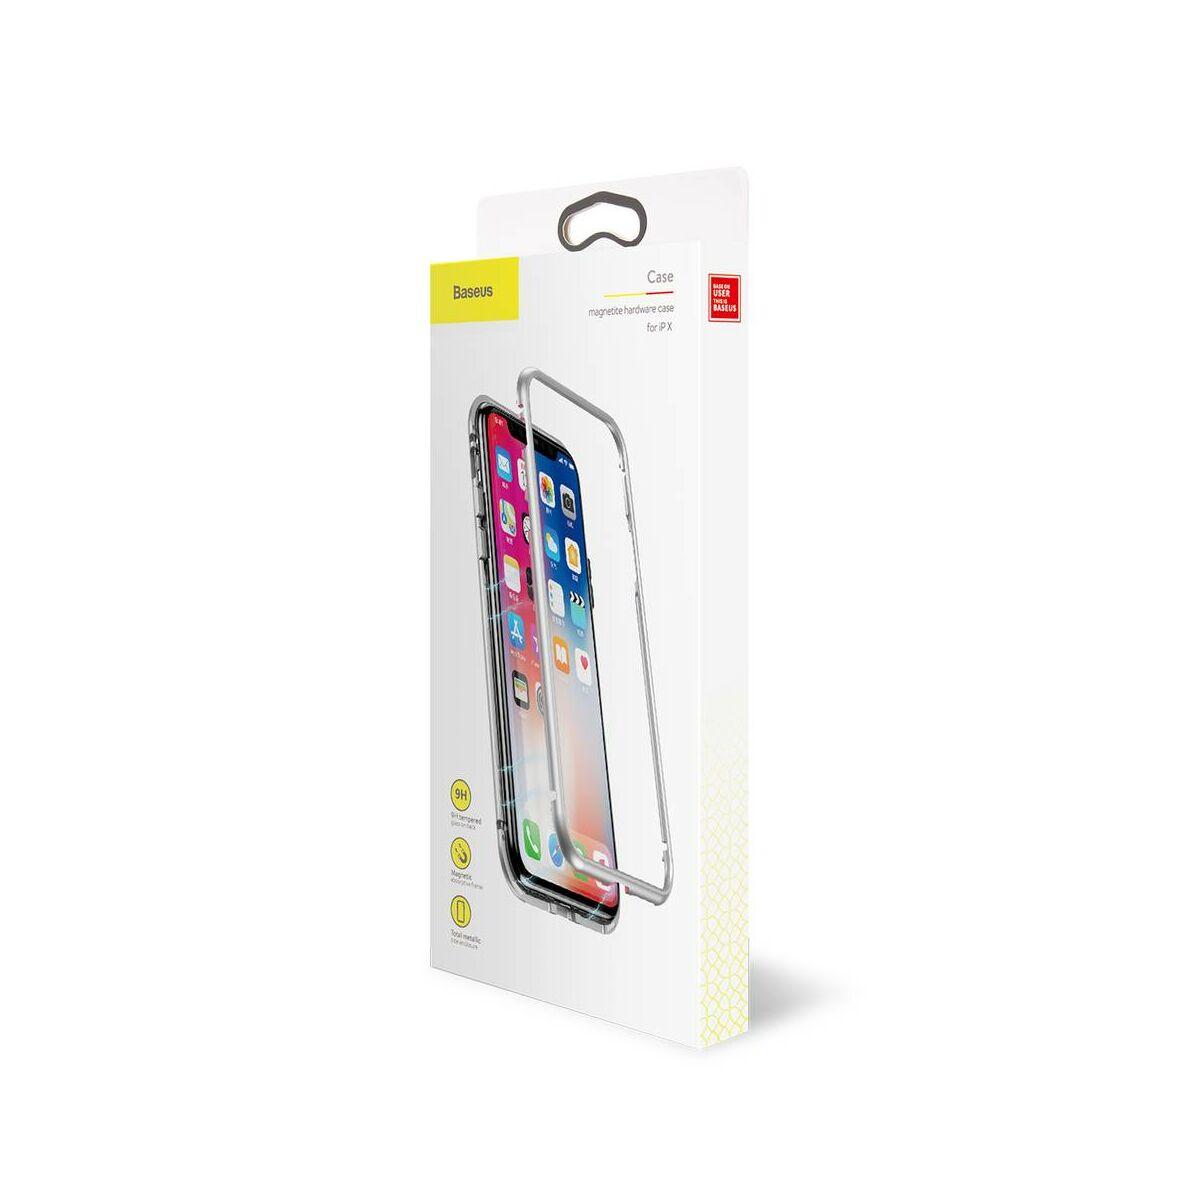 Baseus iPhone X/XS tok, Magnetite hardware, mágneses, ezüst (WIAPIPHX-CS0S)